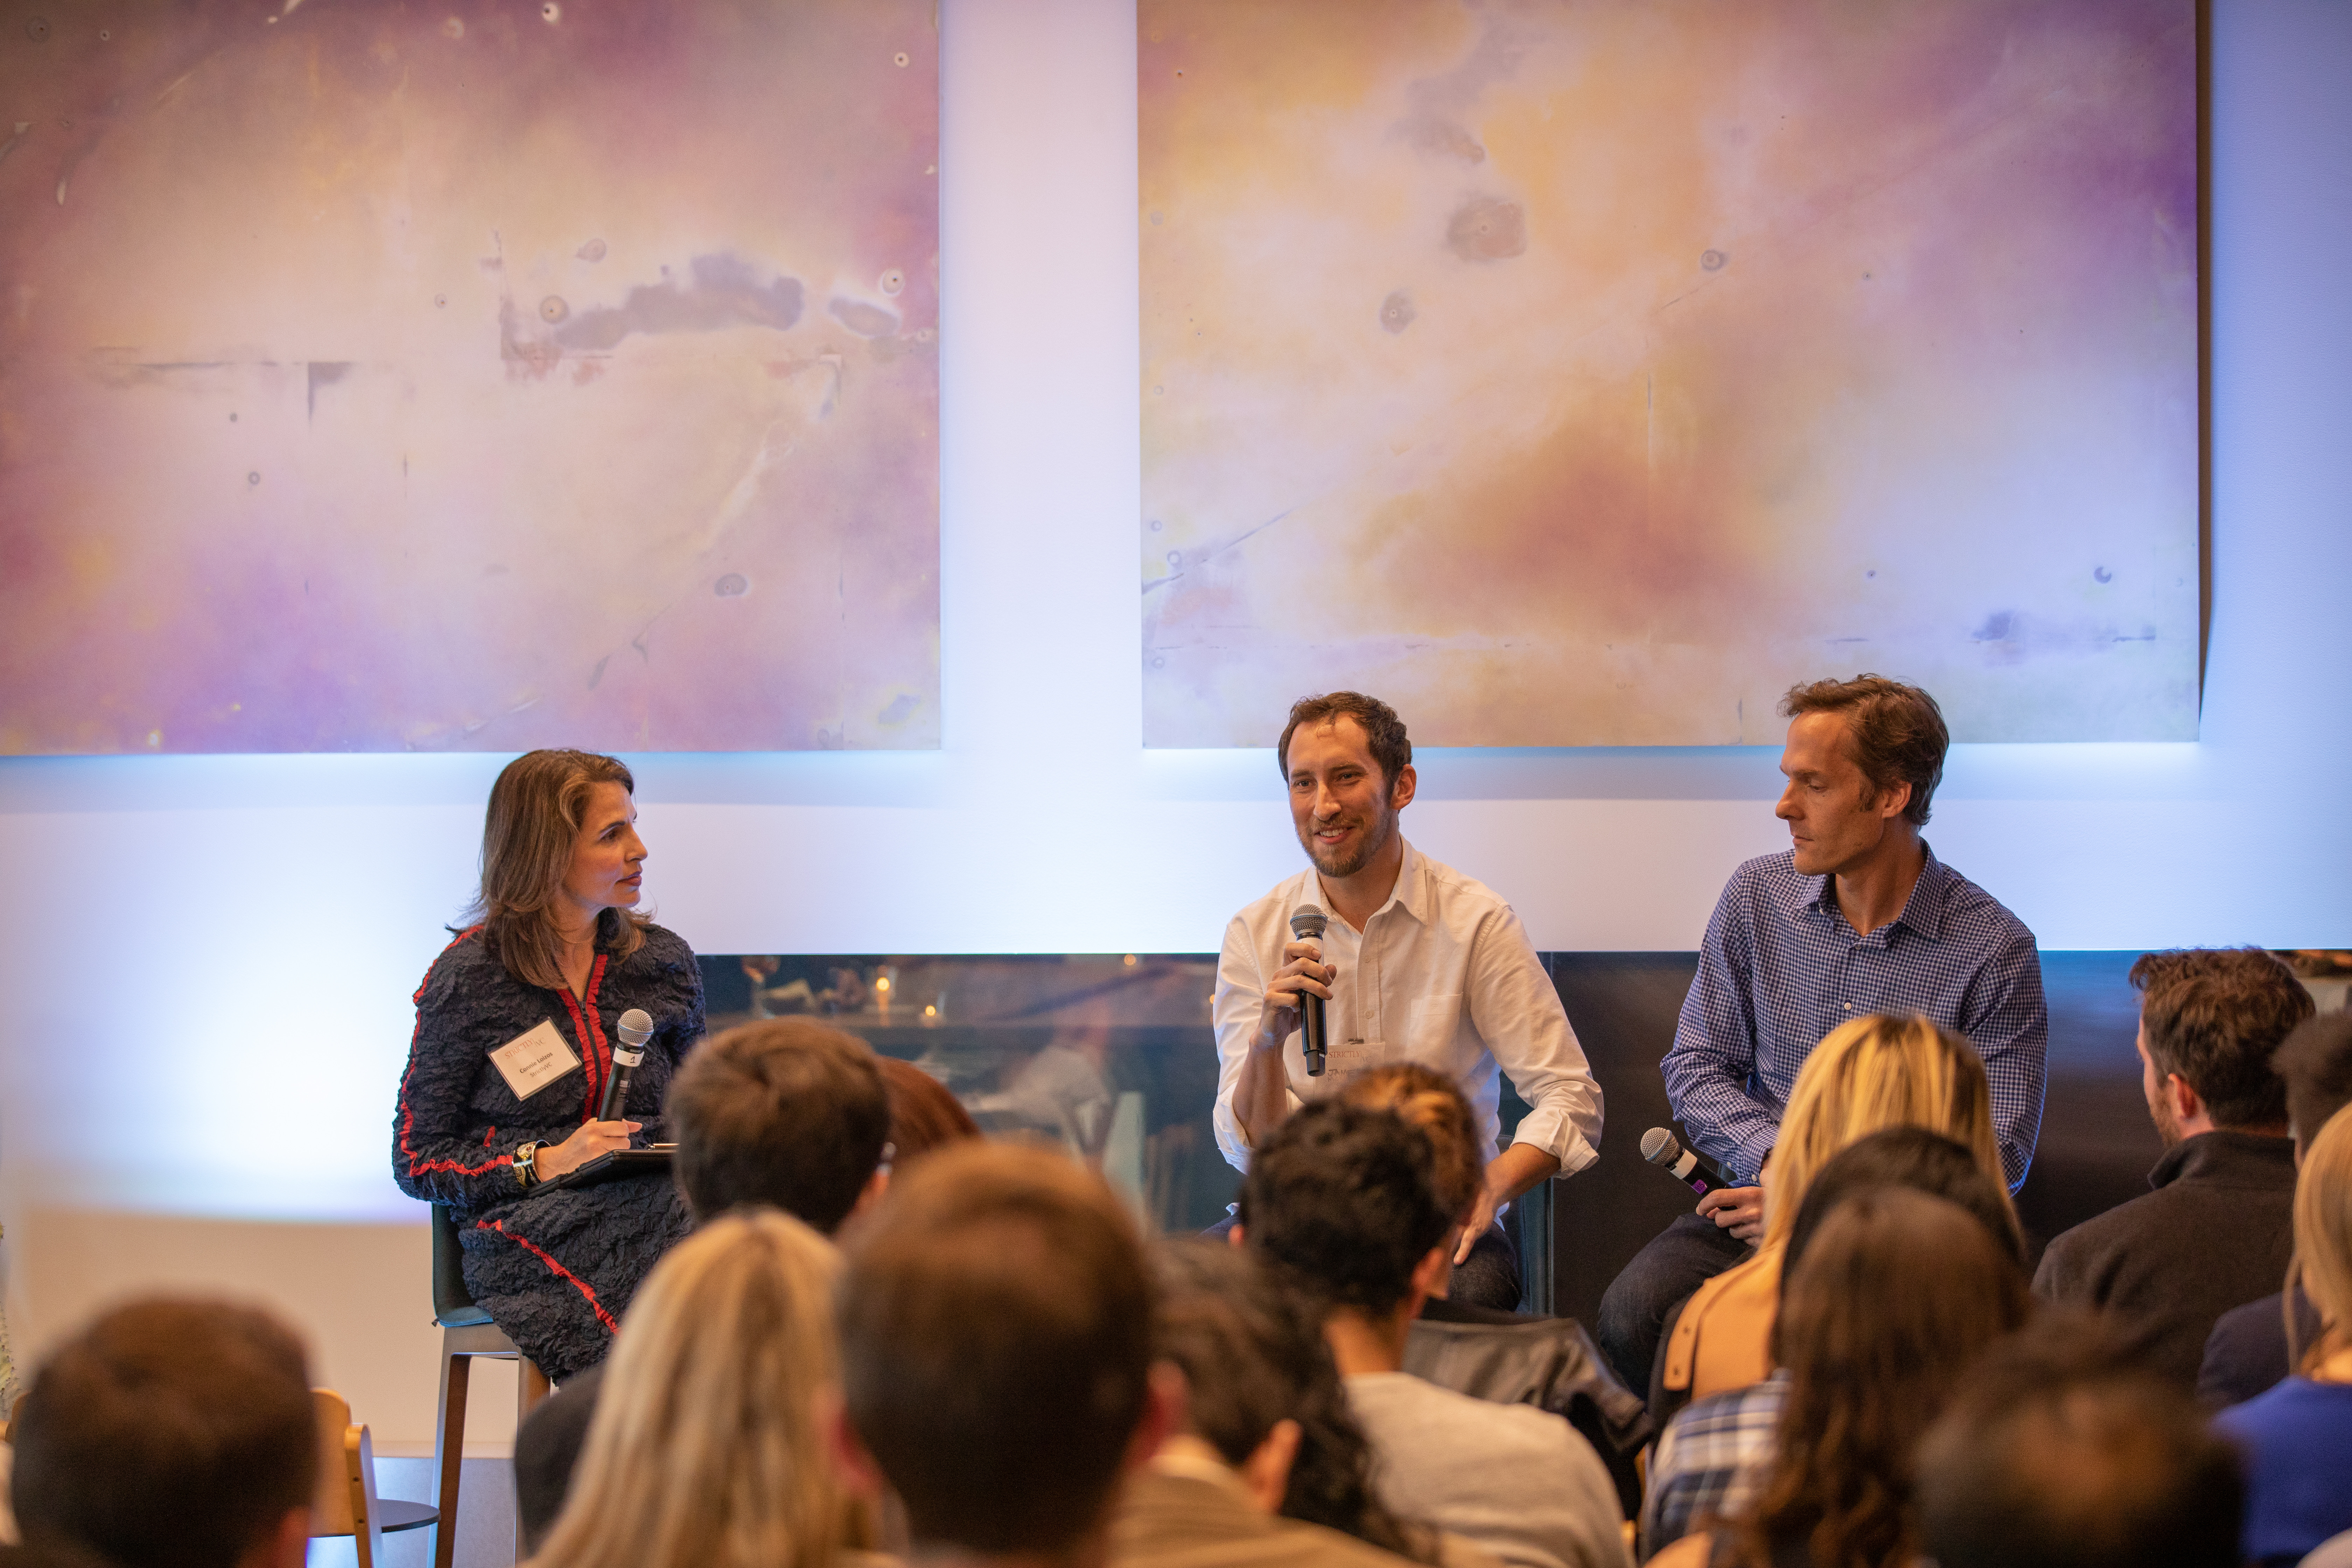 Juul, the popular e-cig startup under growing FDA scrutiny